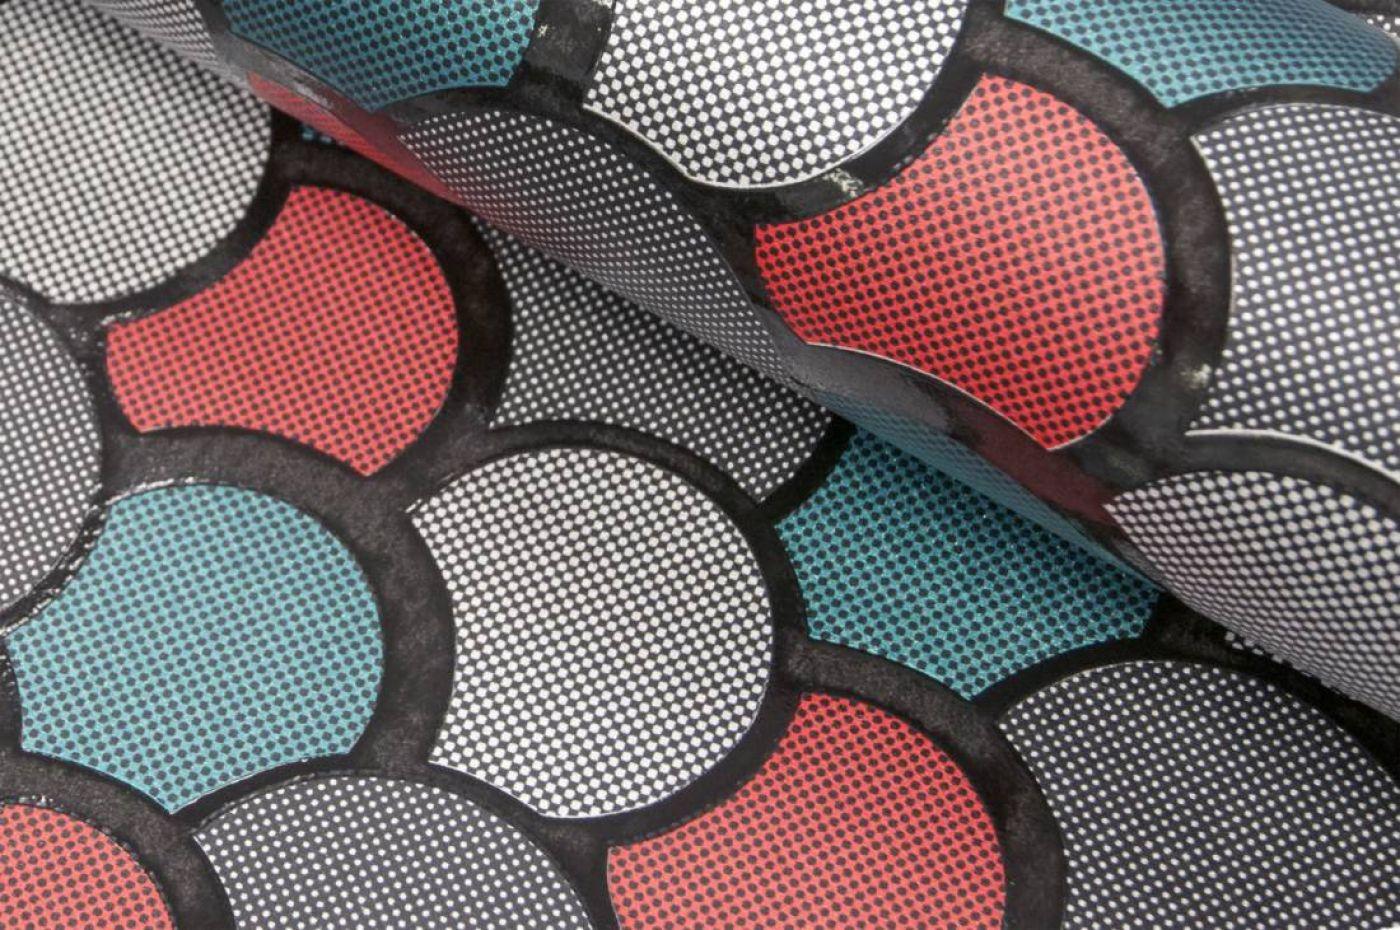 figura seite 2 farben sch fer. Black Bedroom Furniture Sets. Home Design Ideas